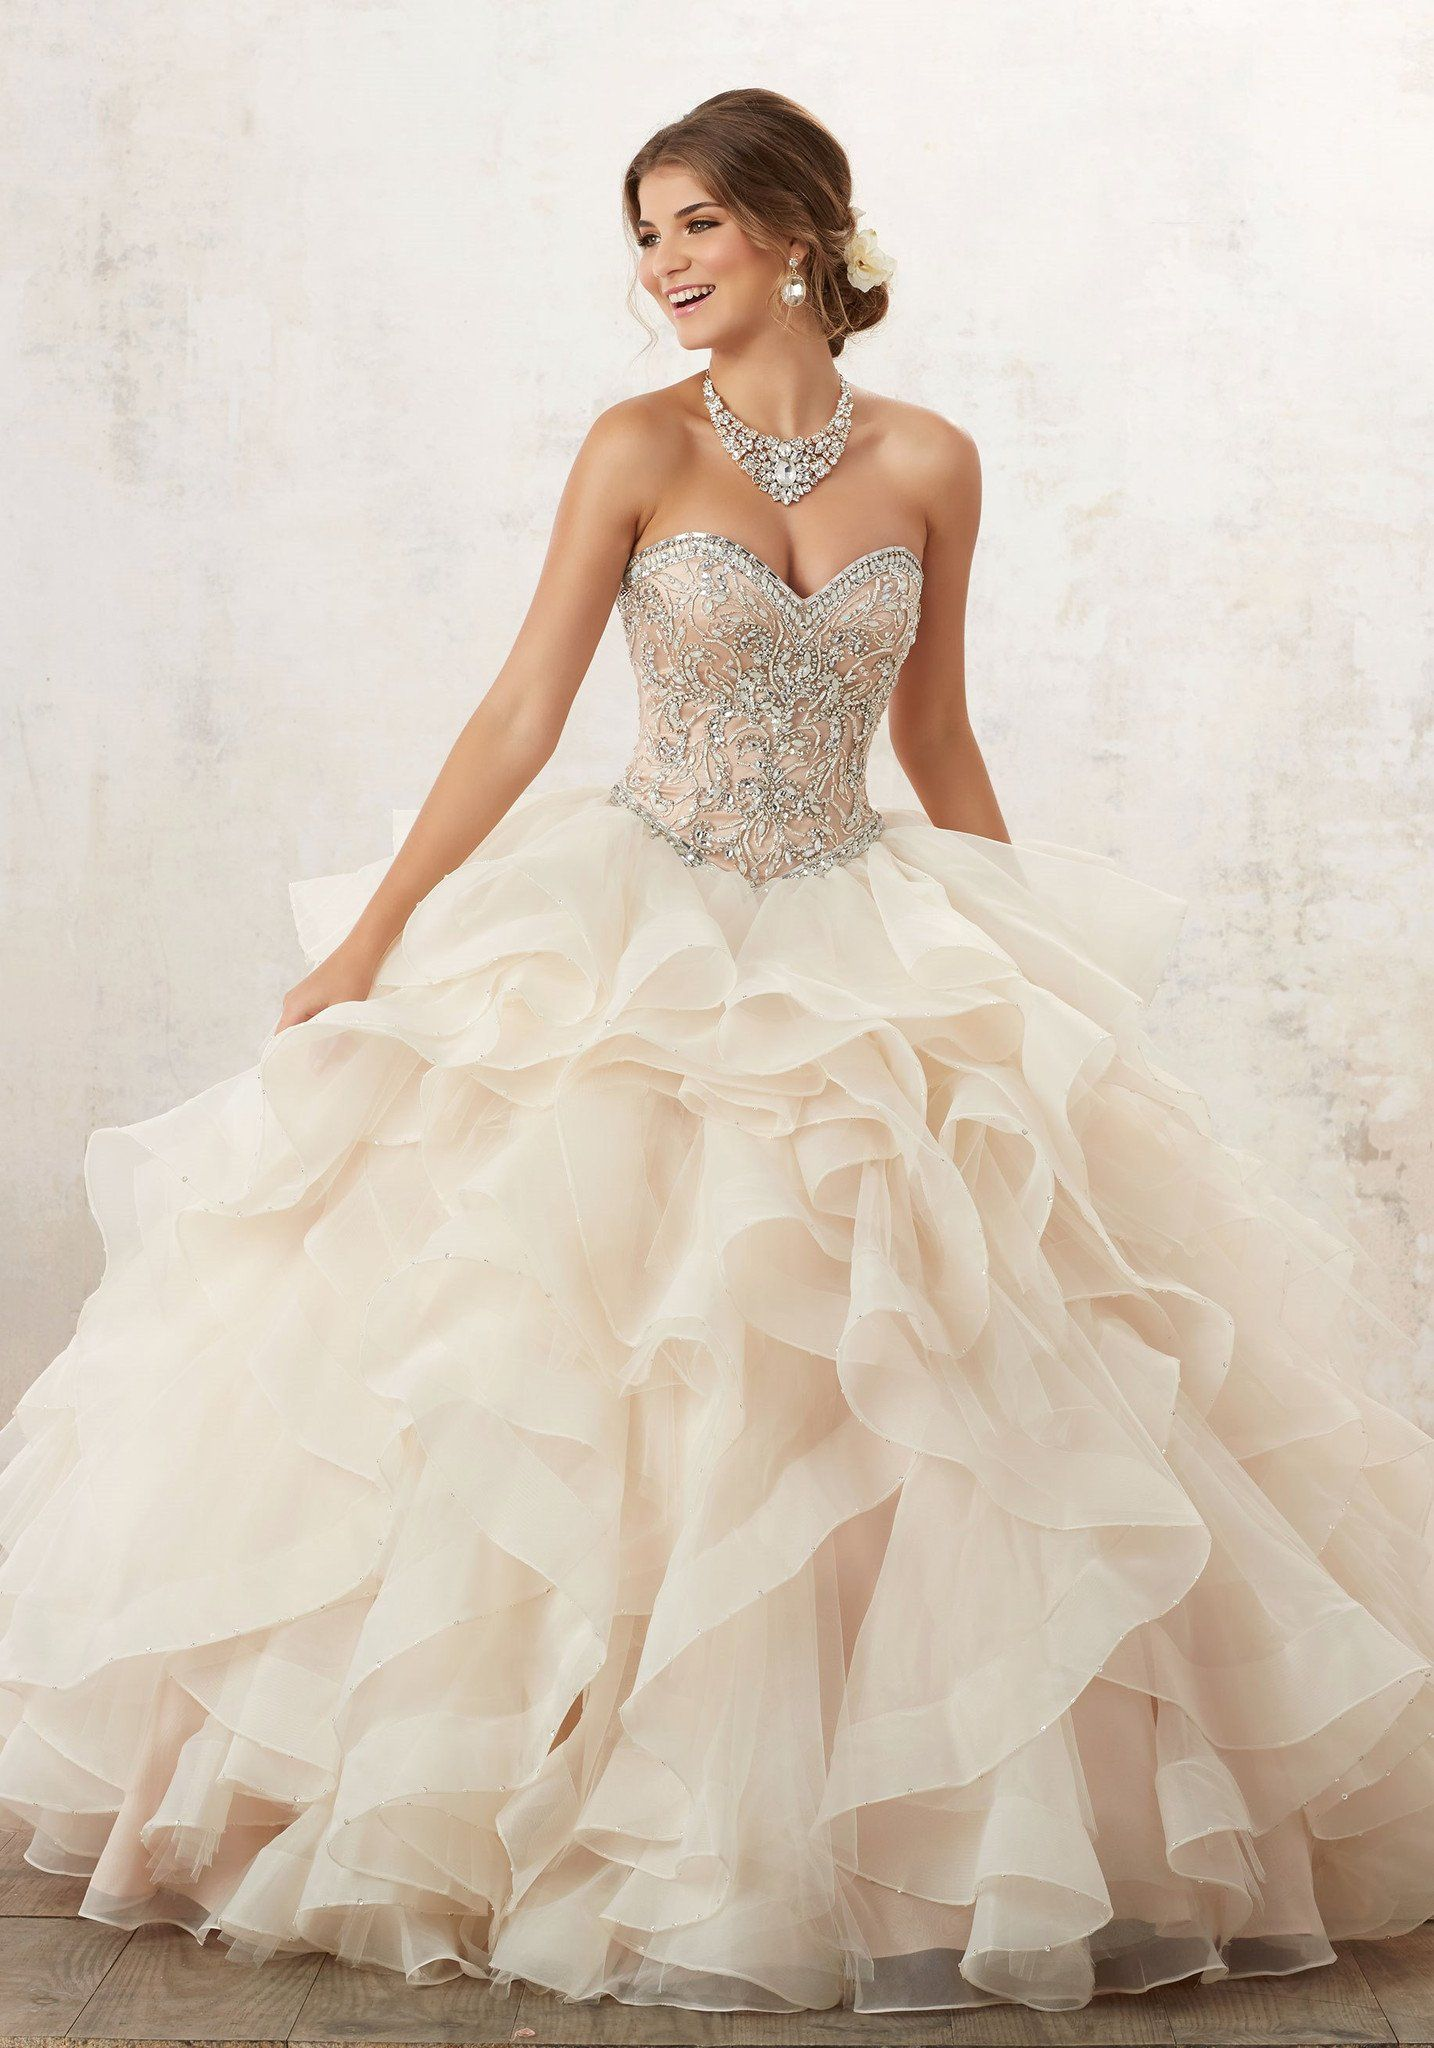 Strapless Ruffled Quinceanera Dress By Mori Lee Vizcaya 89126 Quinceanera Dresses Mori Lee Quinceanera Dresses Sweet 16 Dresses [ 2048 x 1434 Pixel ]